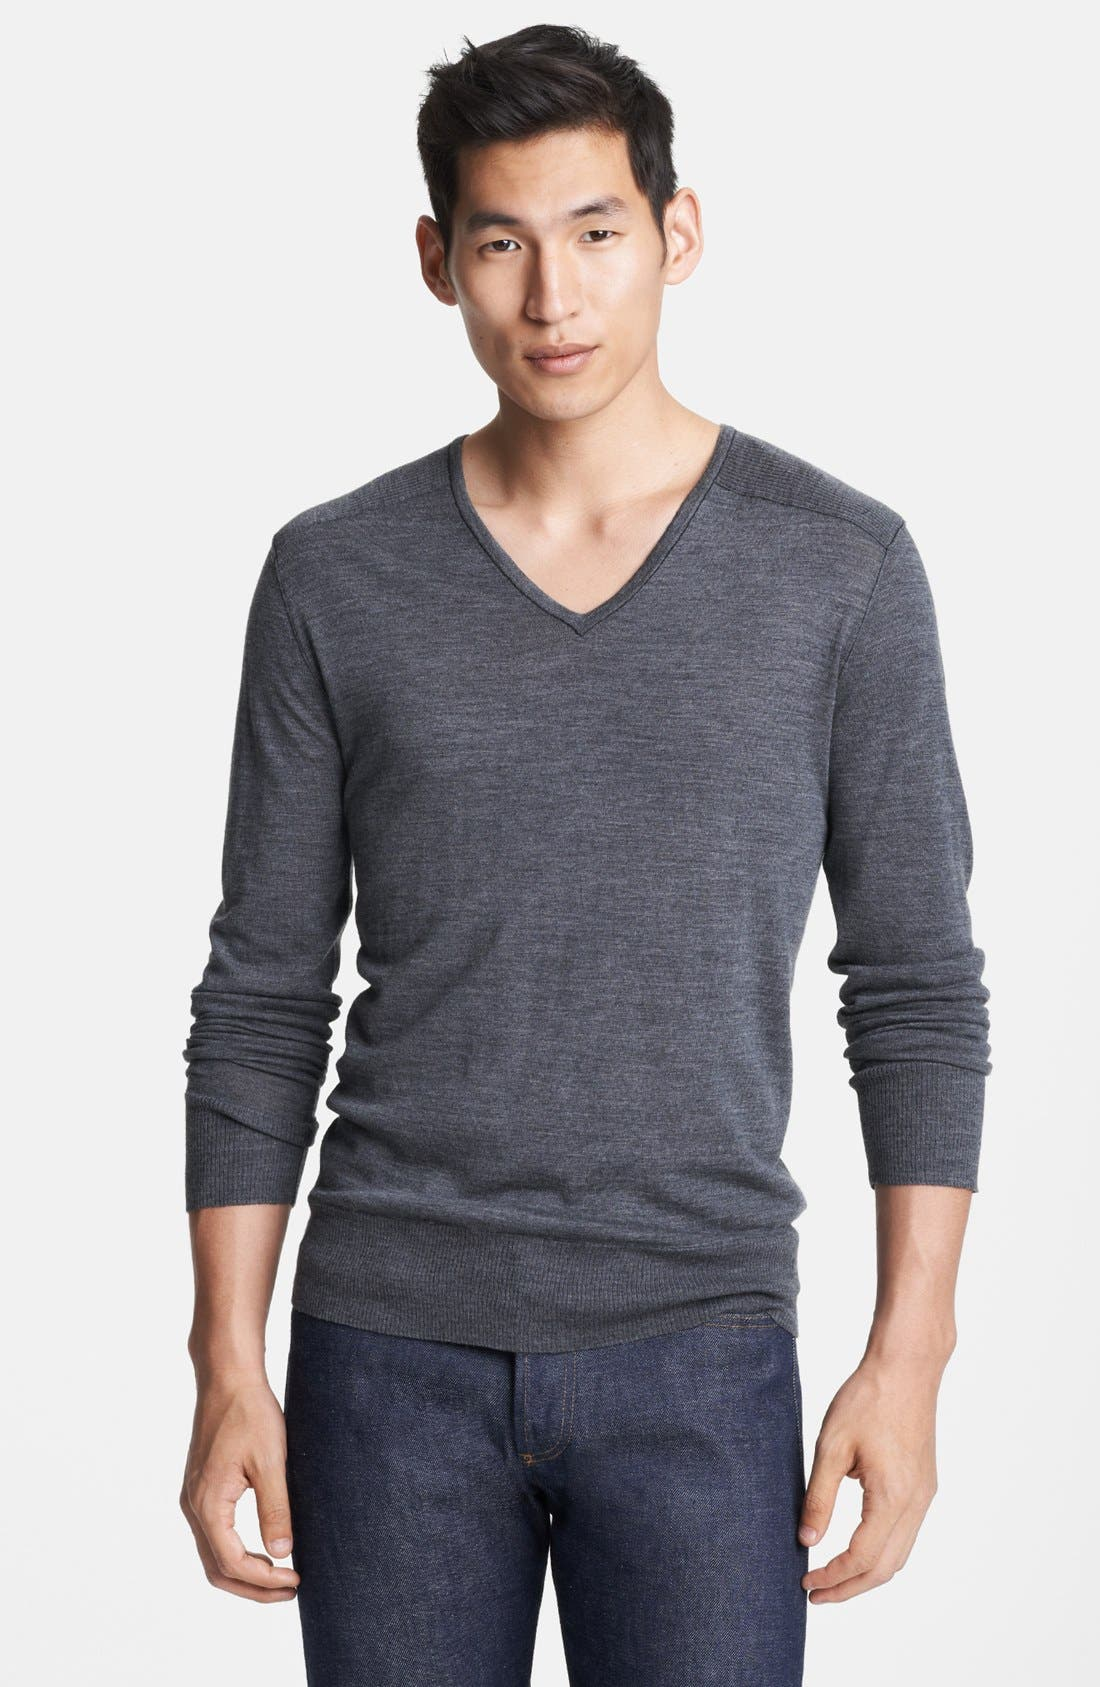 Alternate Image 1 Selected - John Varvatos Collection Merino Wool V-Neck Sweater